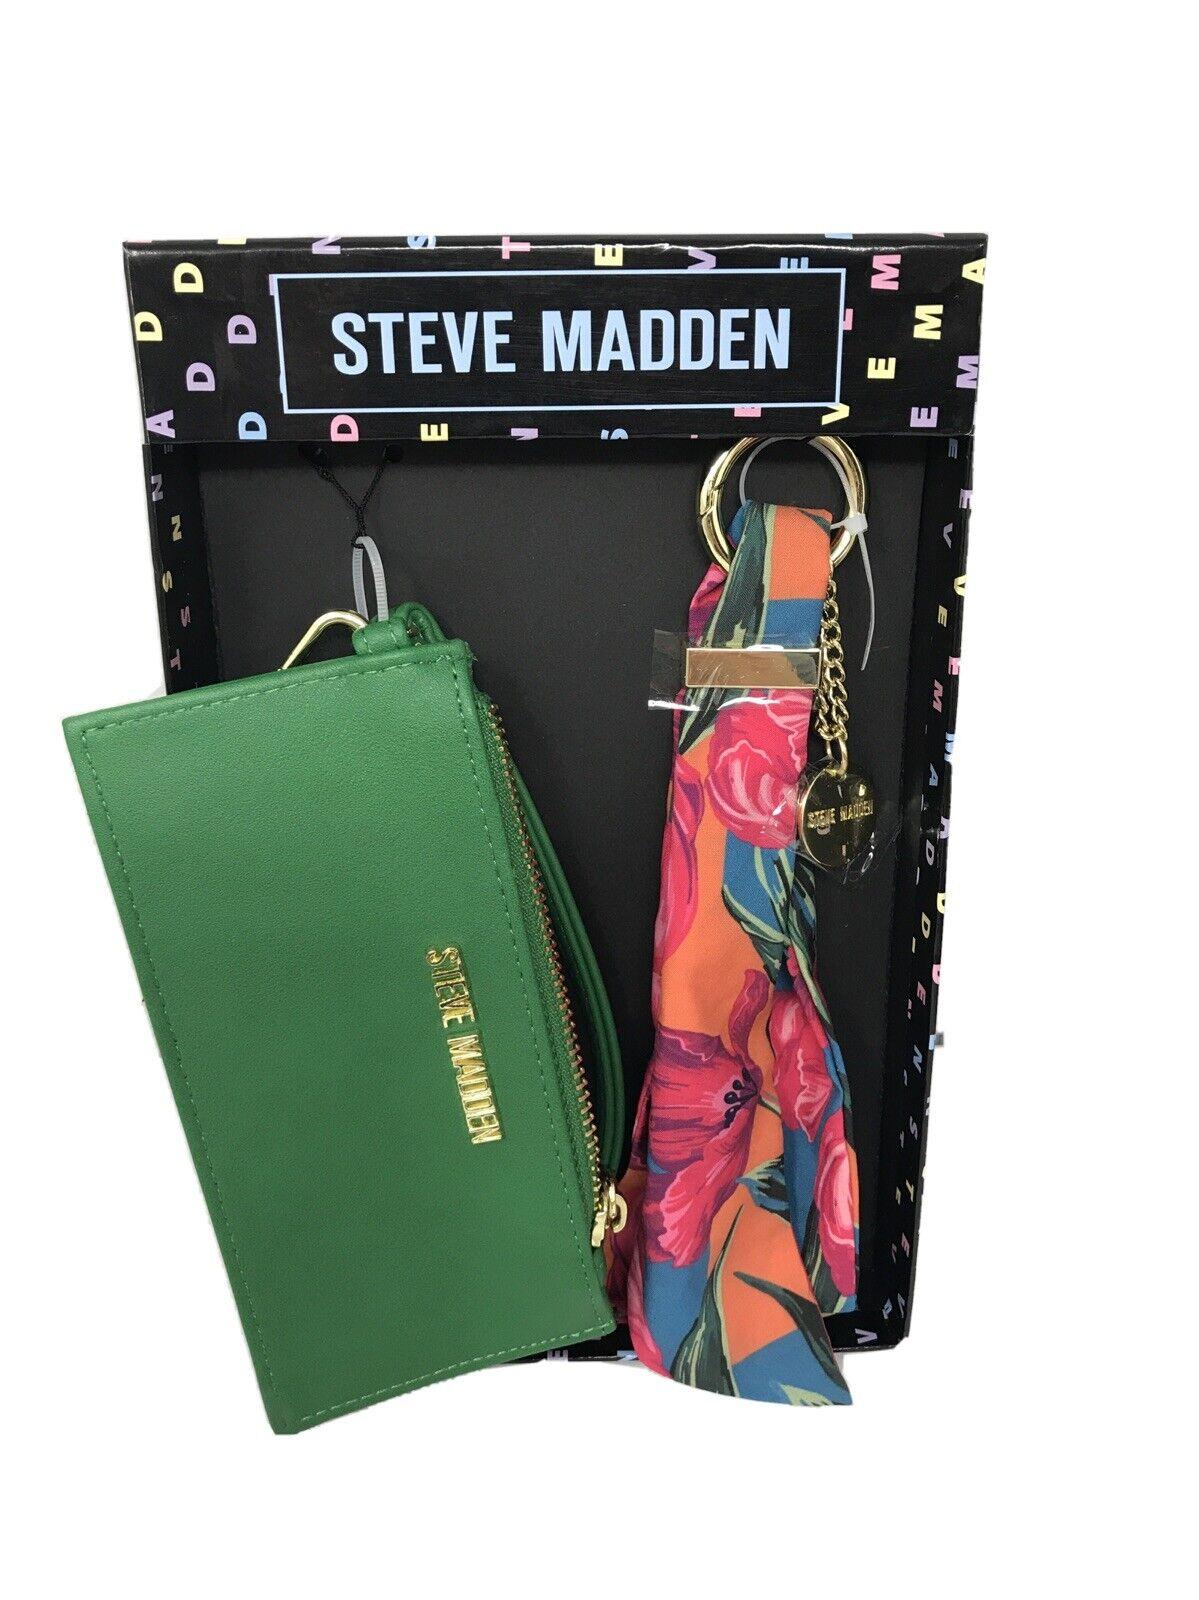 Steve Madden 2 Pieces CC Case&Key R